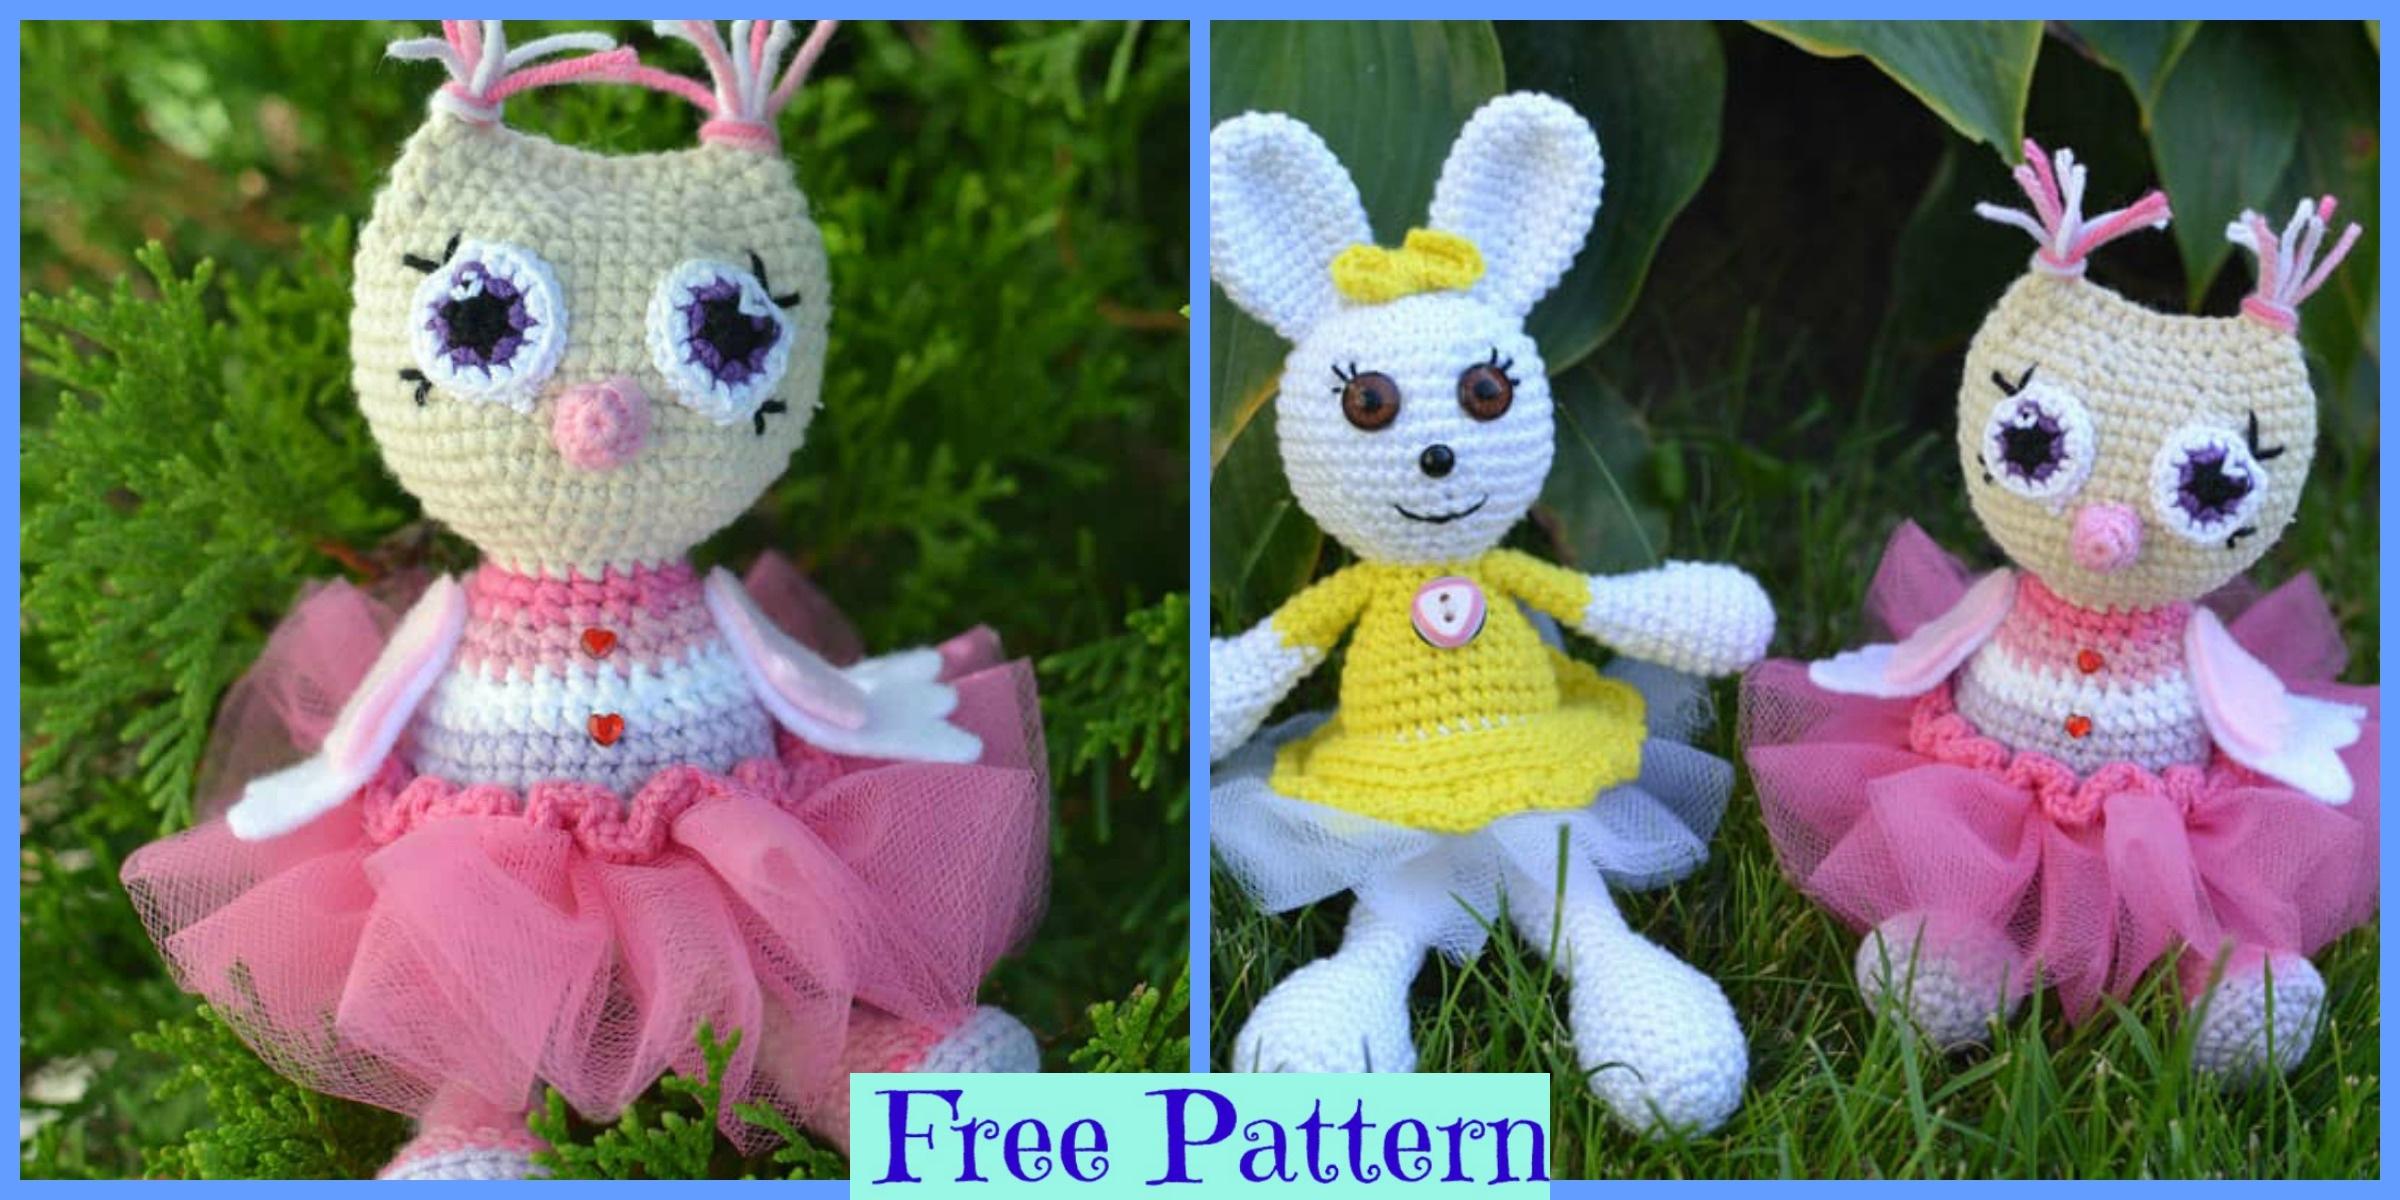 Crochet Owl Princess Amigurumi – Free Pattern